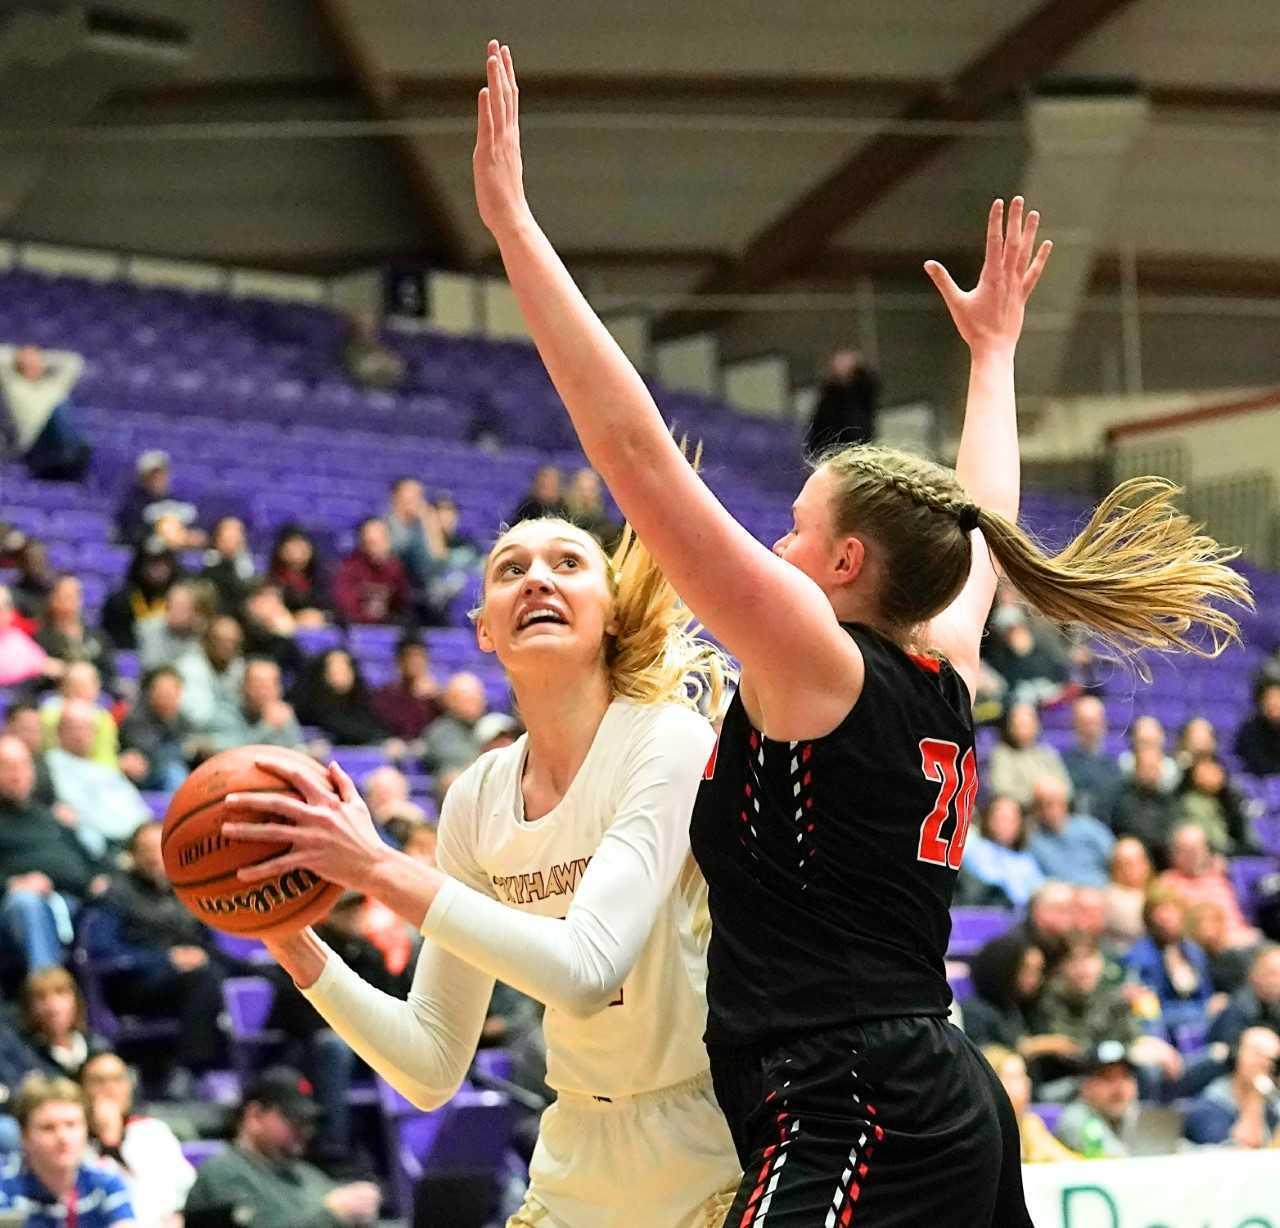 Southridge's Cameron Brink turns to shoot against Beaverton's Laura Erikstrup. (Photo by Jon Olson)